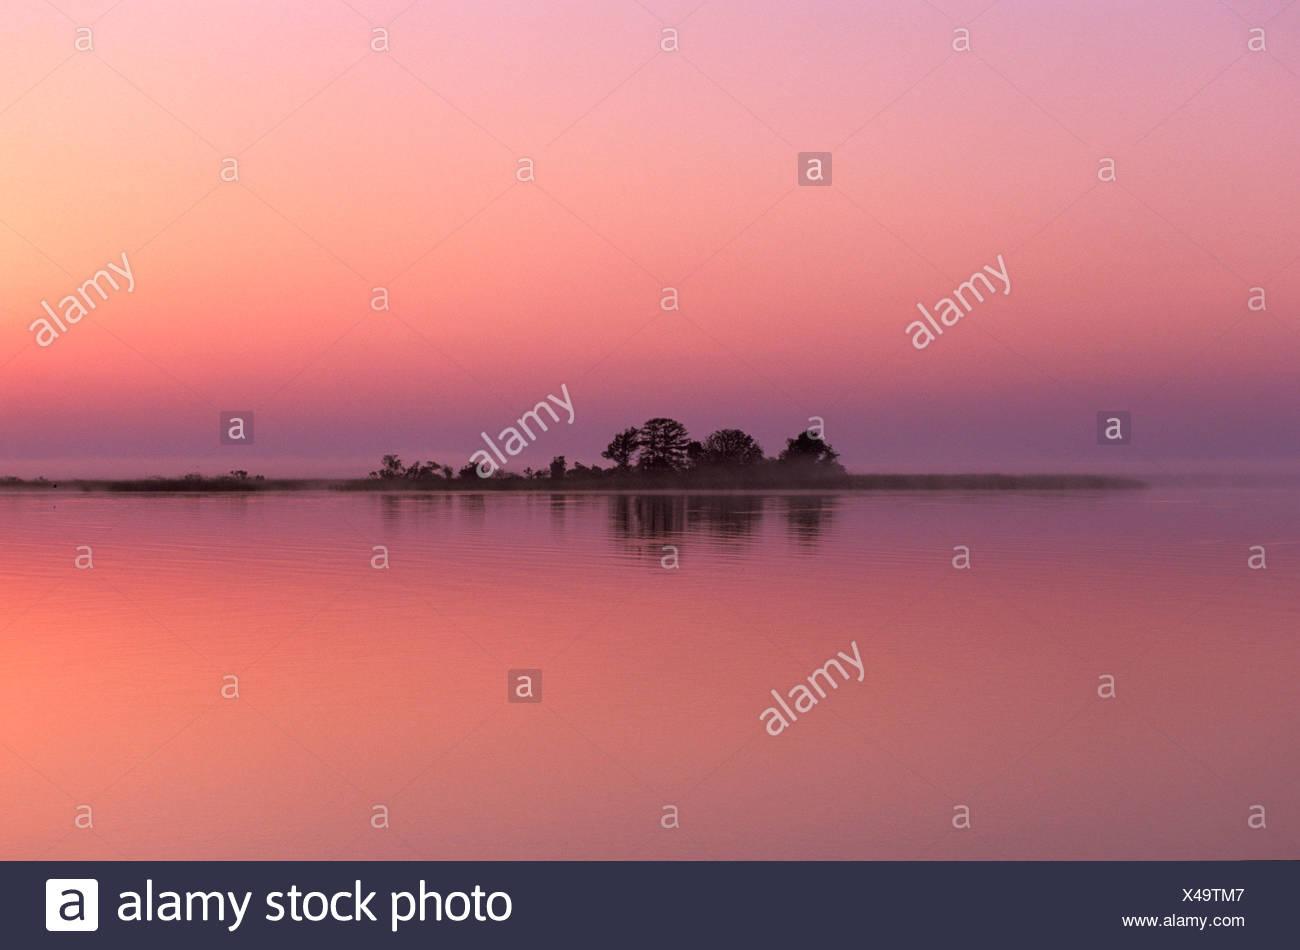 Sunrise, Apalachicola, Gulf Coast, Florida, USA, United States, America, island, red - Stock Image